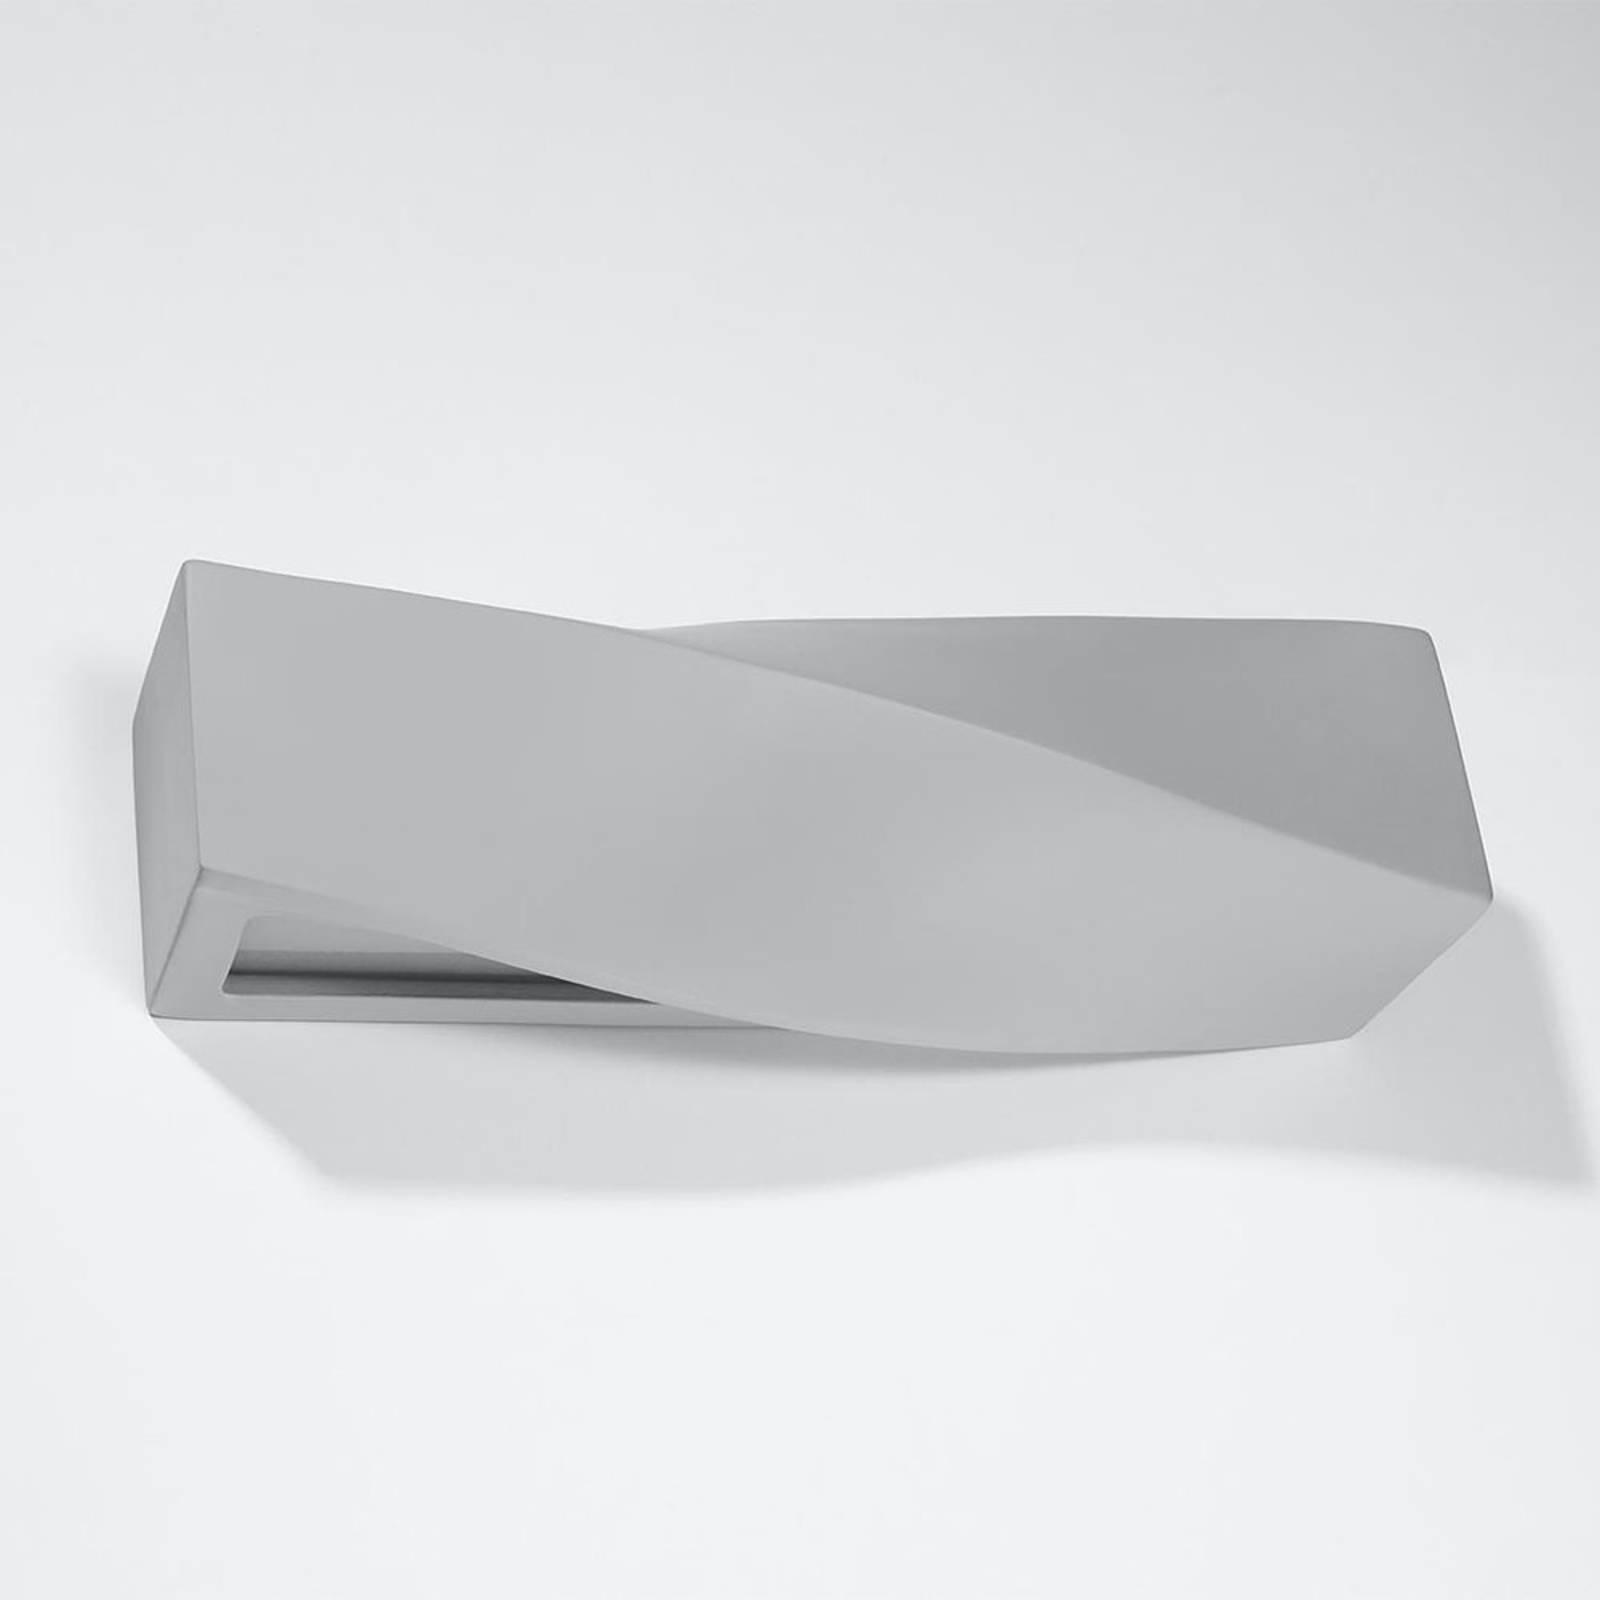 Wandleuchte Turn aus Keramik, up/down, grau